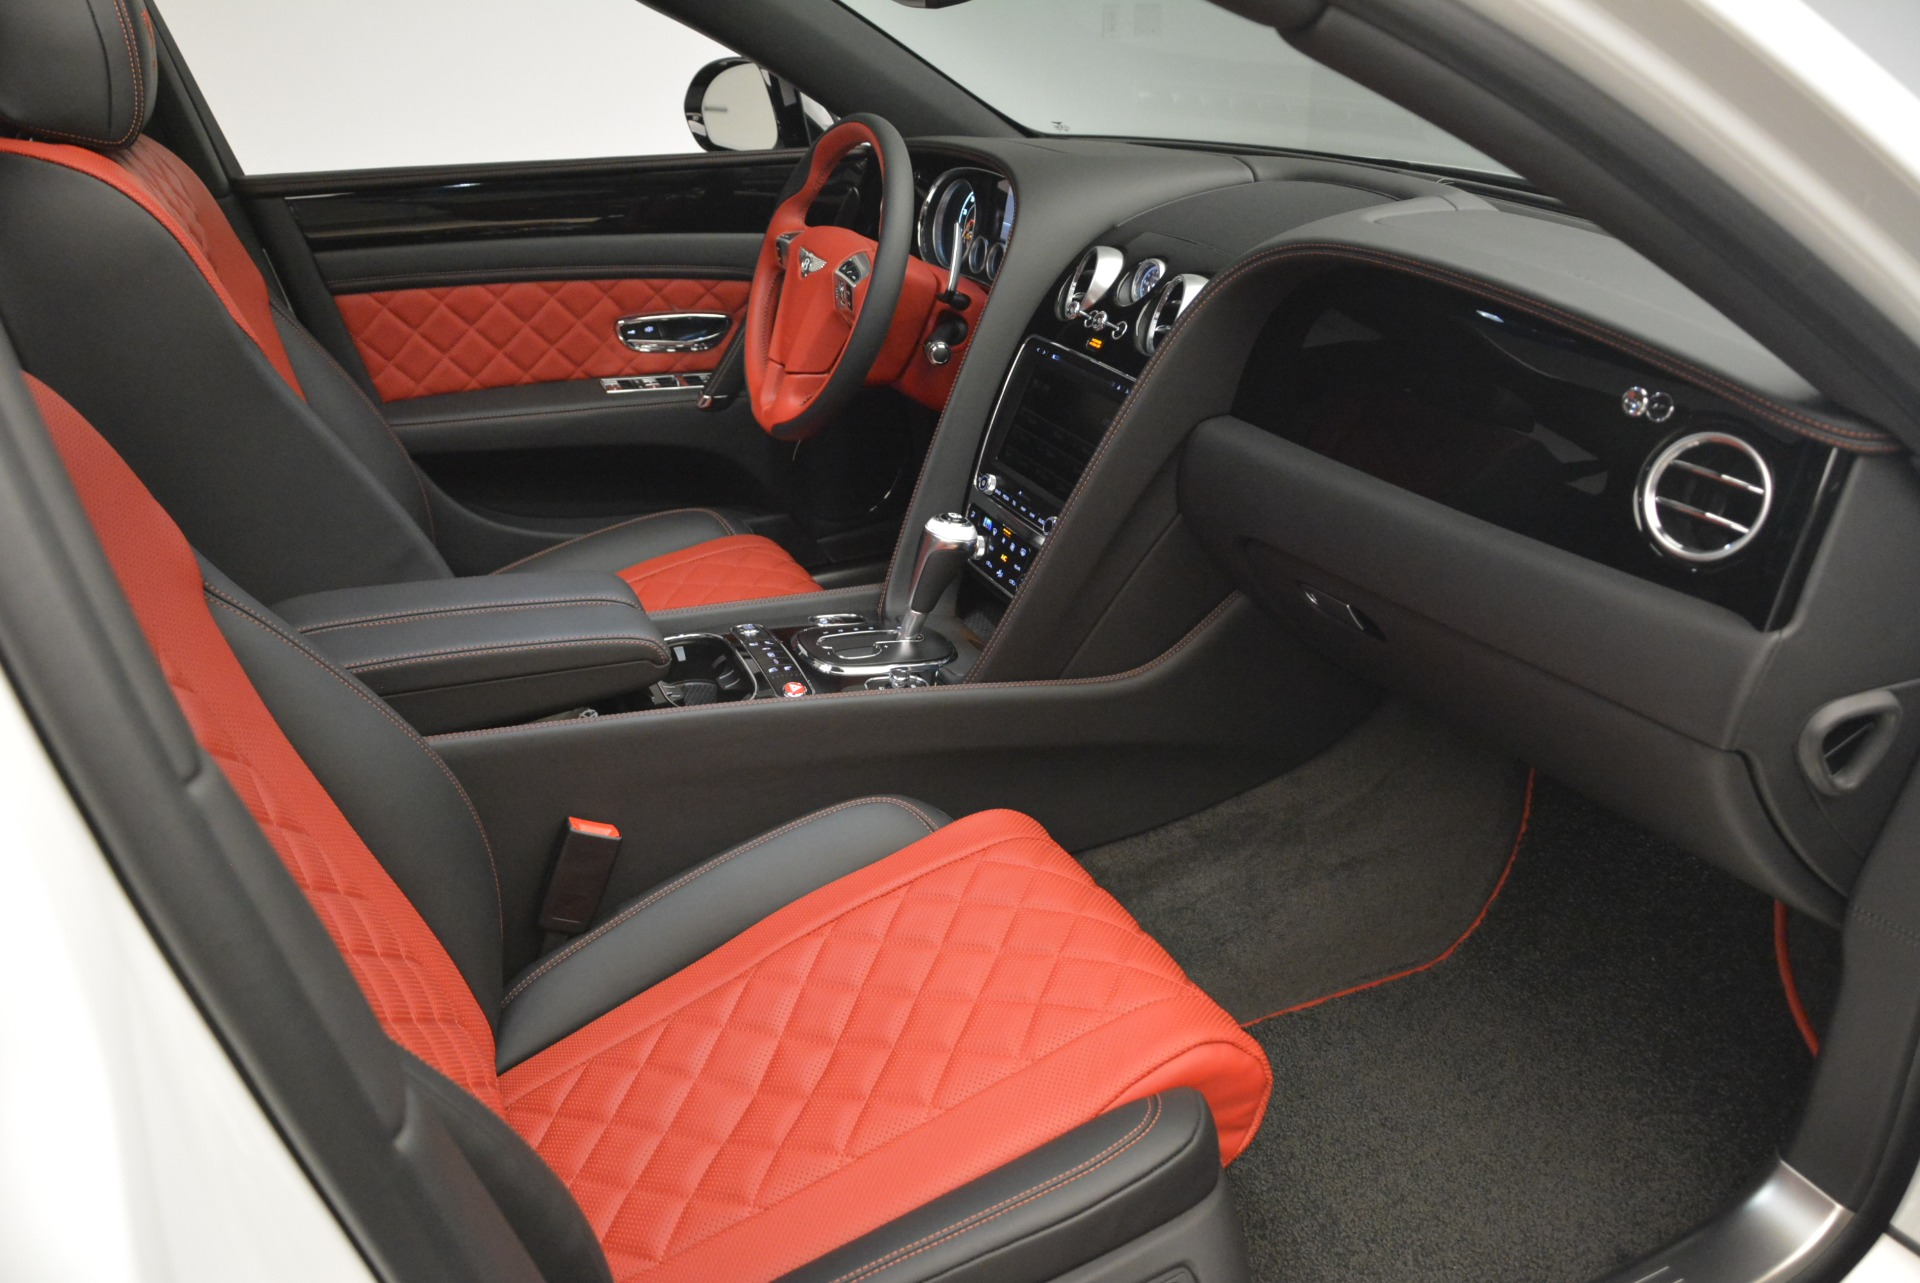 New 2018 Bentley Flying Spur V8 S Black Edition For Sale In Westport, CT 2096_p27